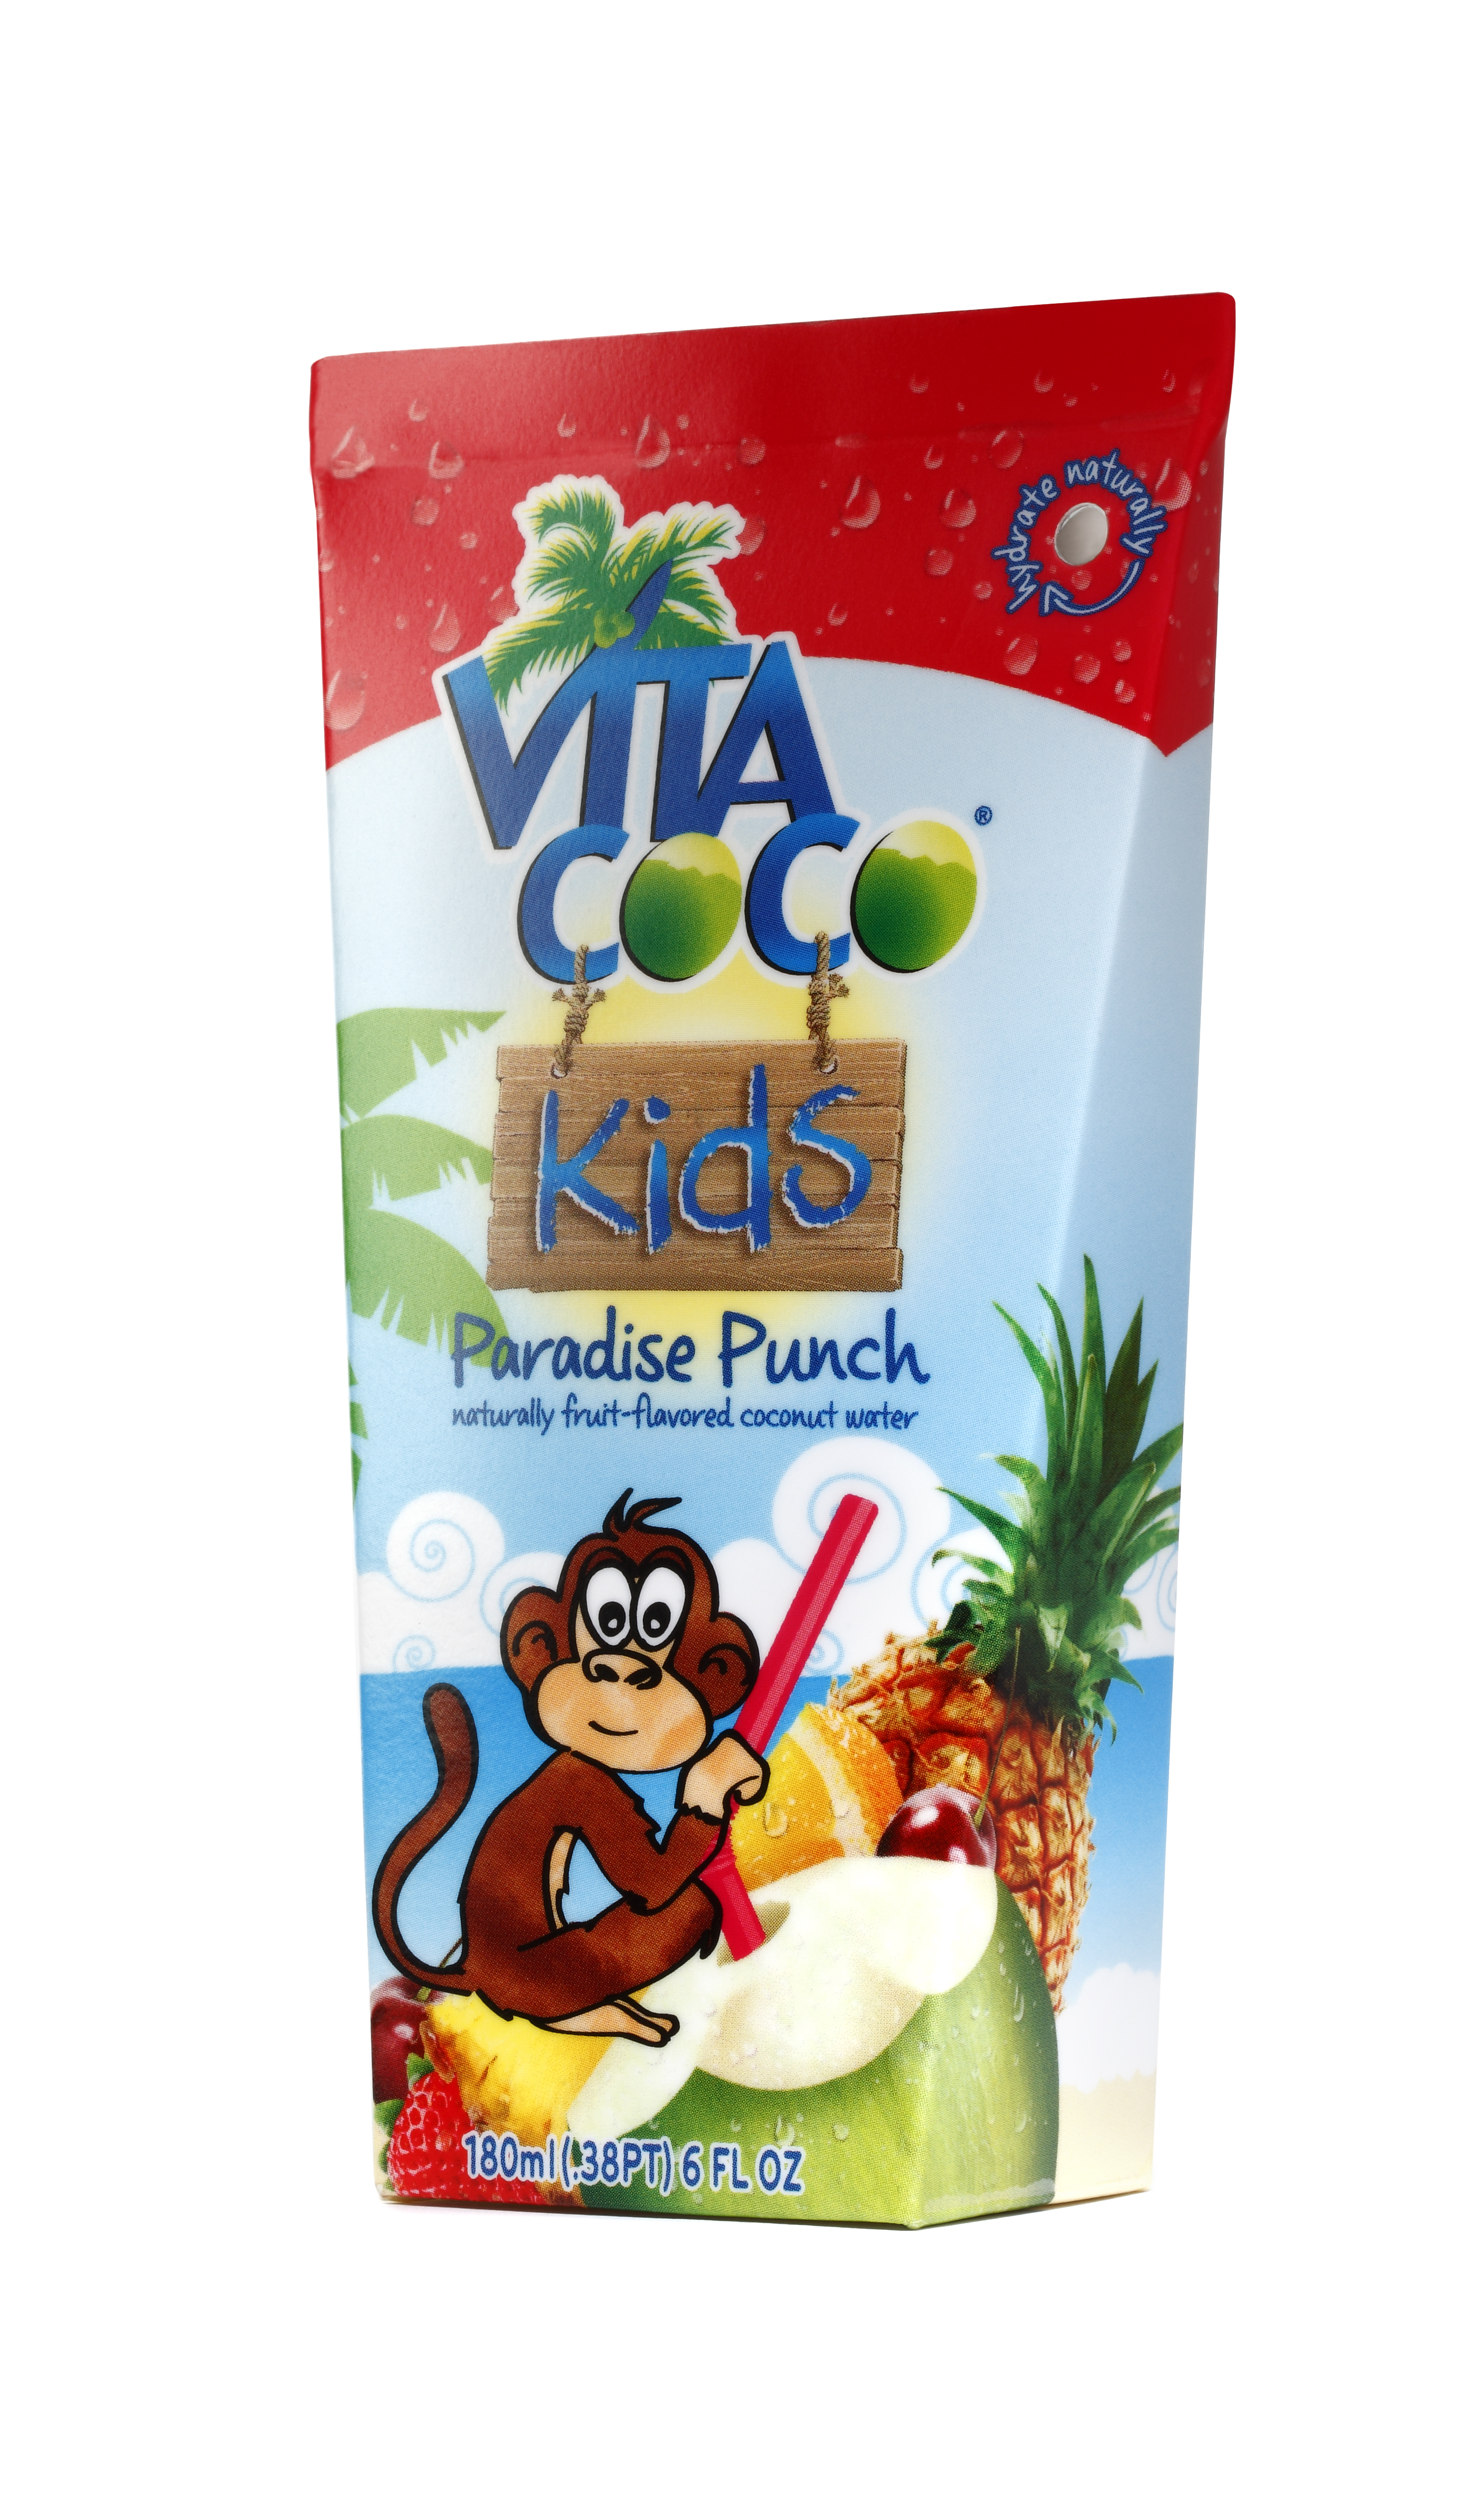 Vita Coco Kids Paradise Punch